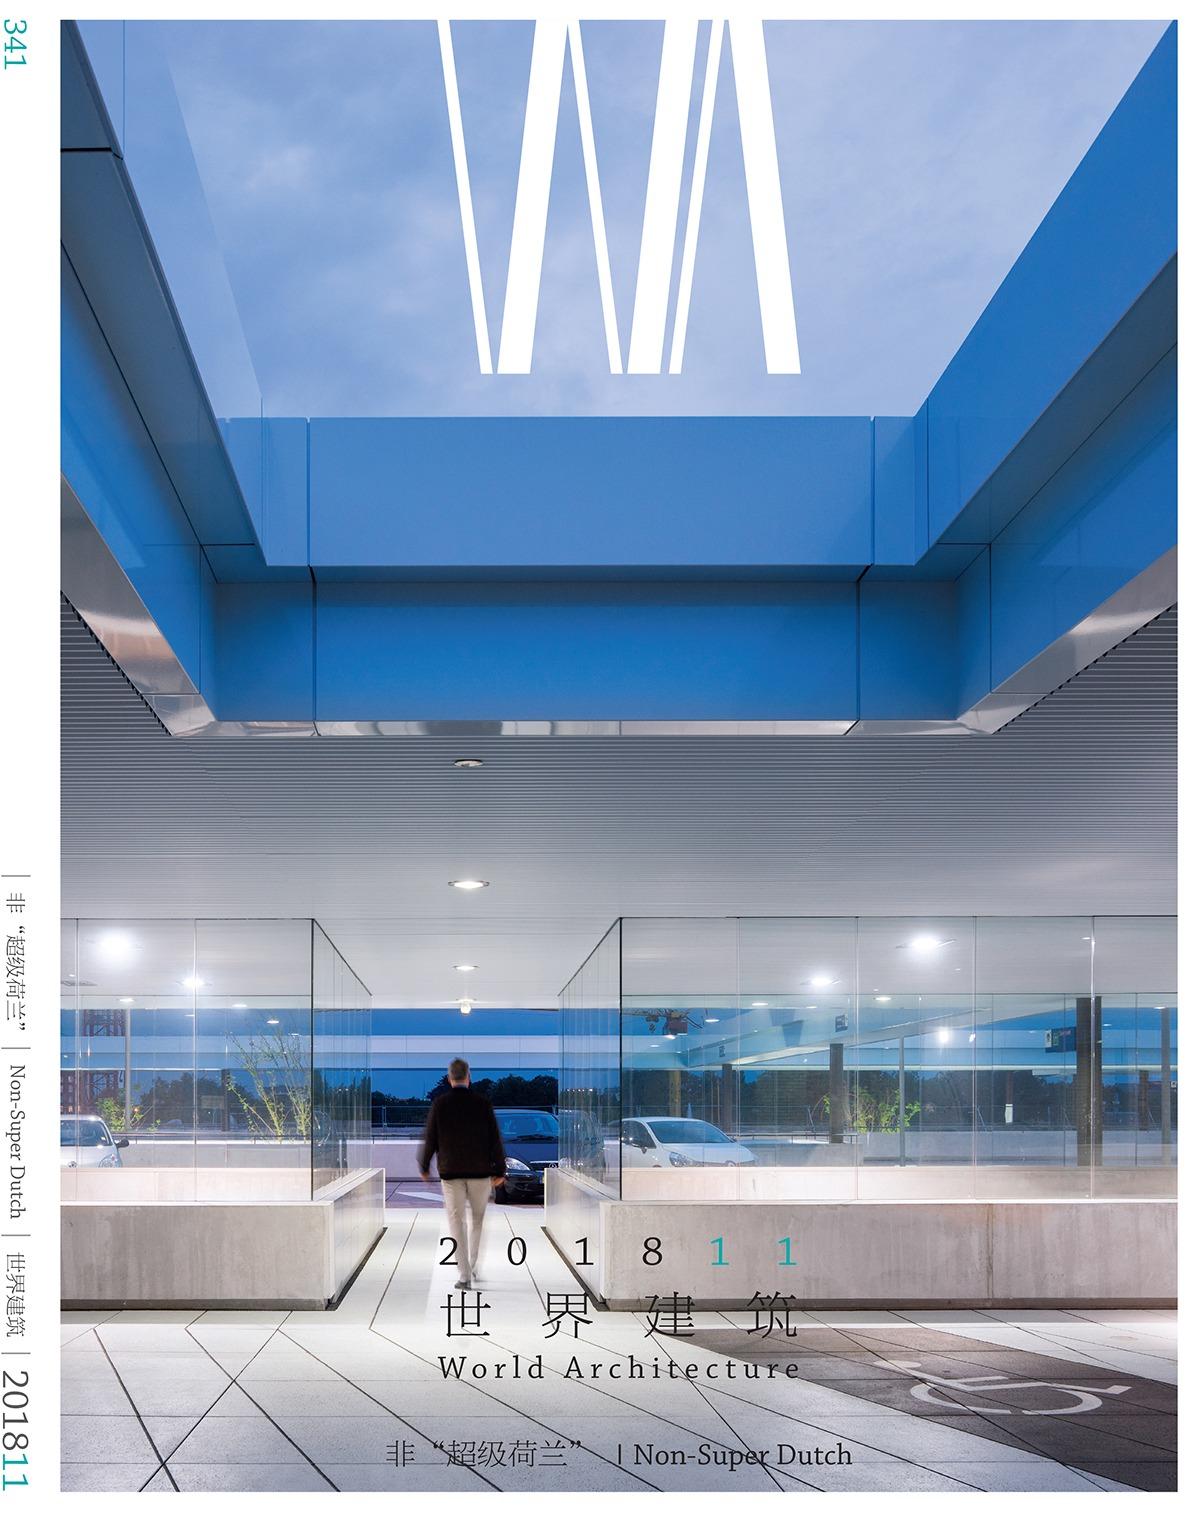 Tuinhuis Almere geselecteerd voor chinese world architecture